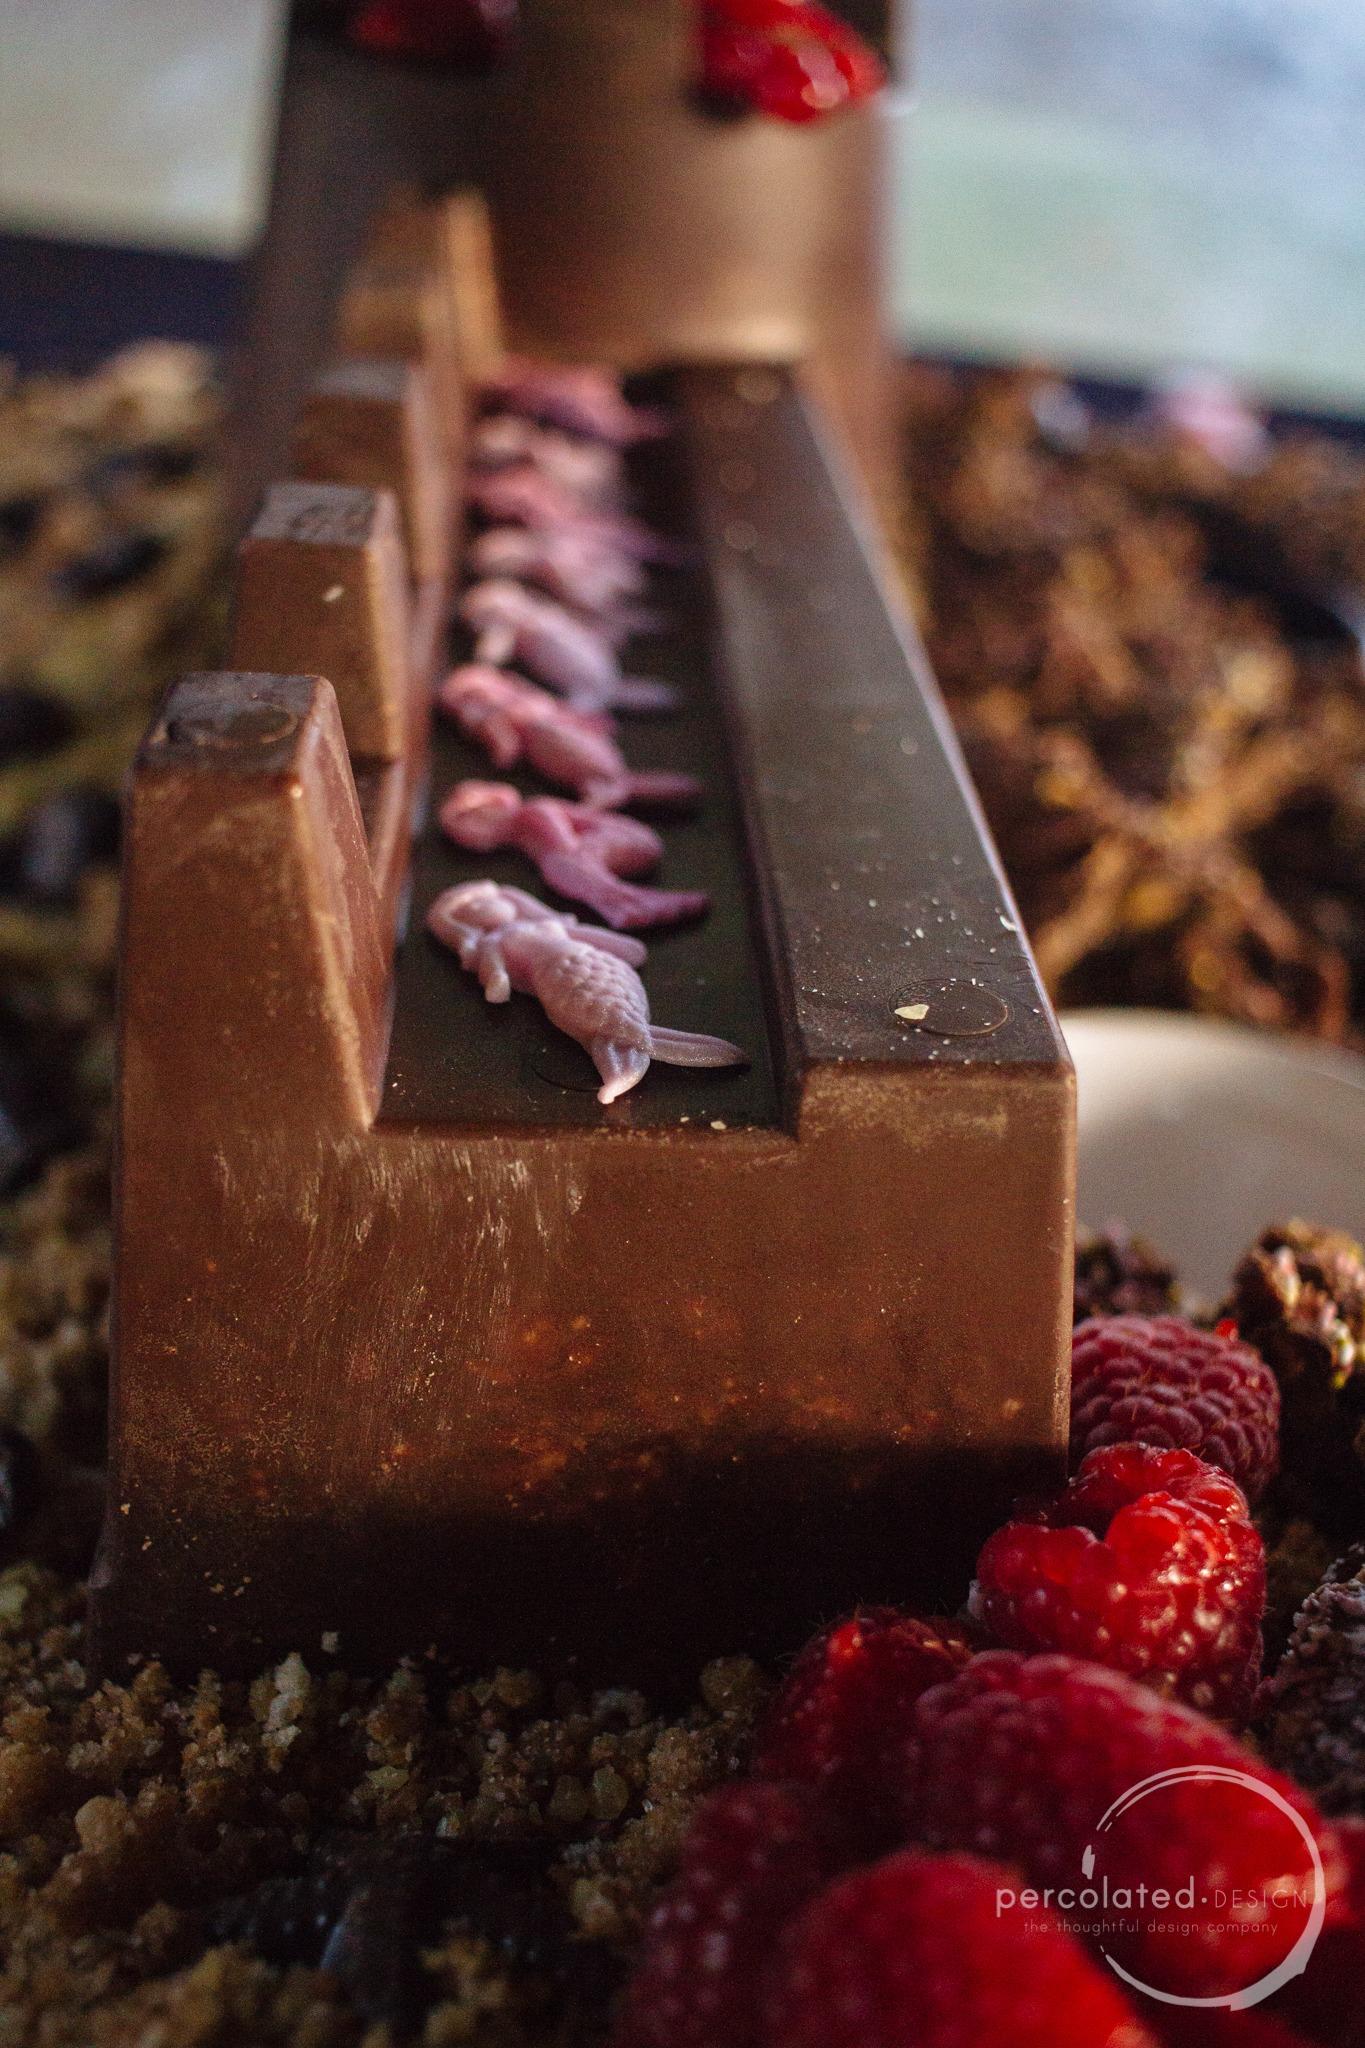 Pirates, Mischief & Feasting with NomNom Chocolate